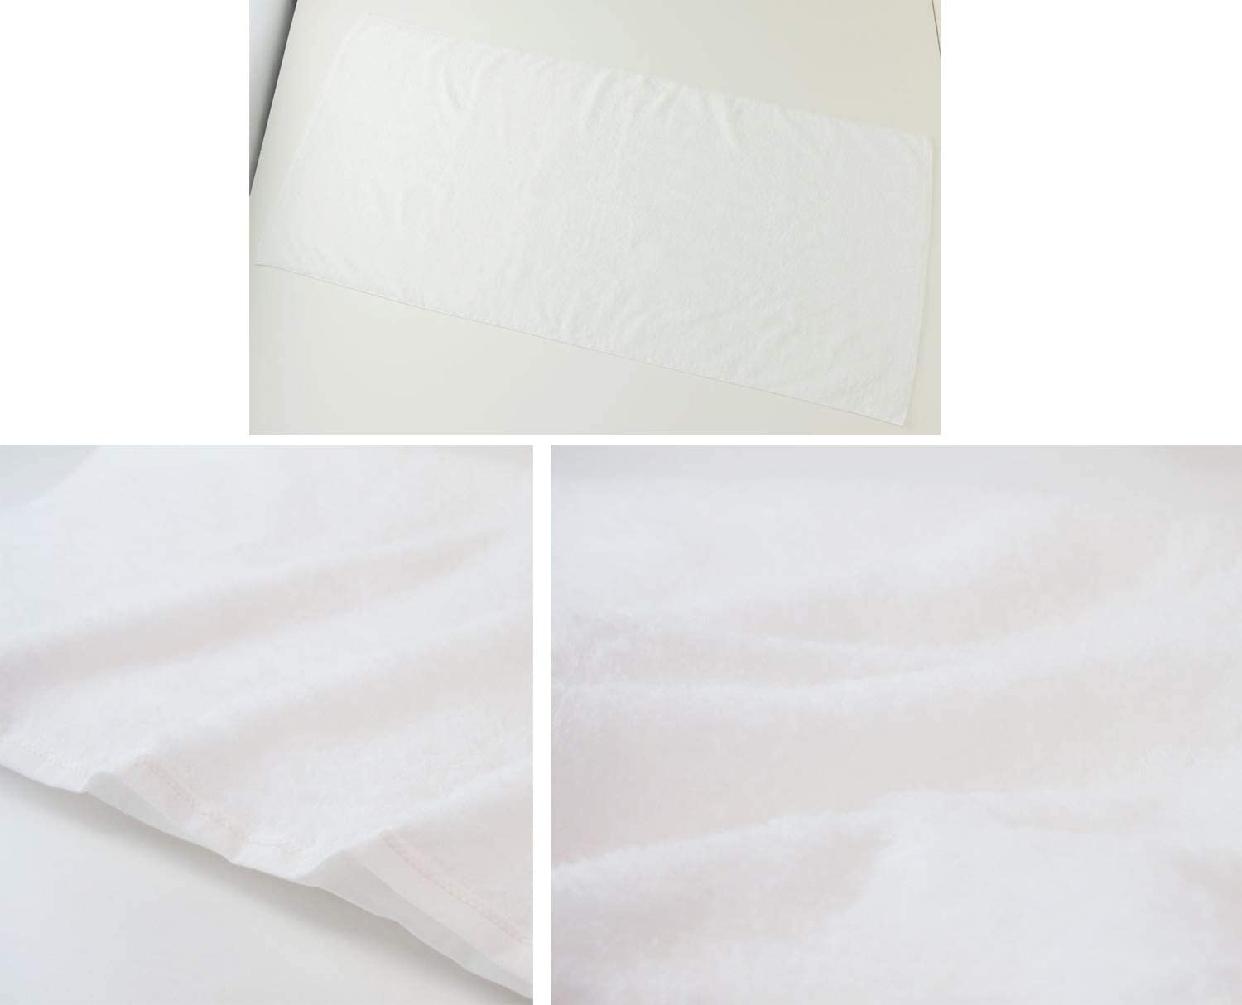 UCHINO(ウチノ) スーパーマシュマロ バスタオル 奇跡のタオルの商品画像2